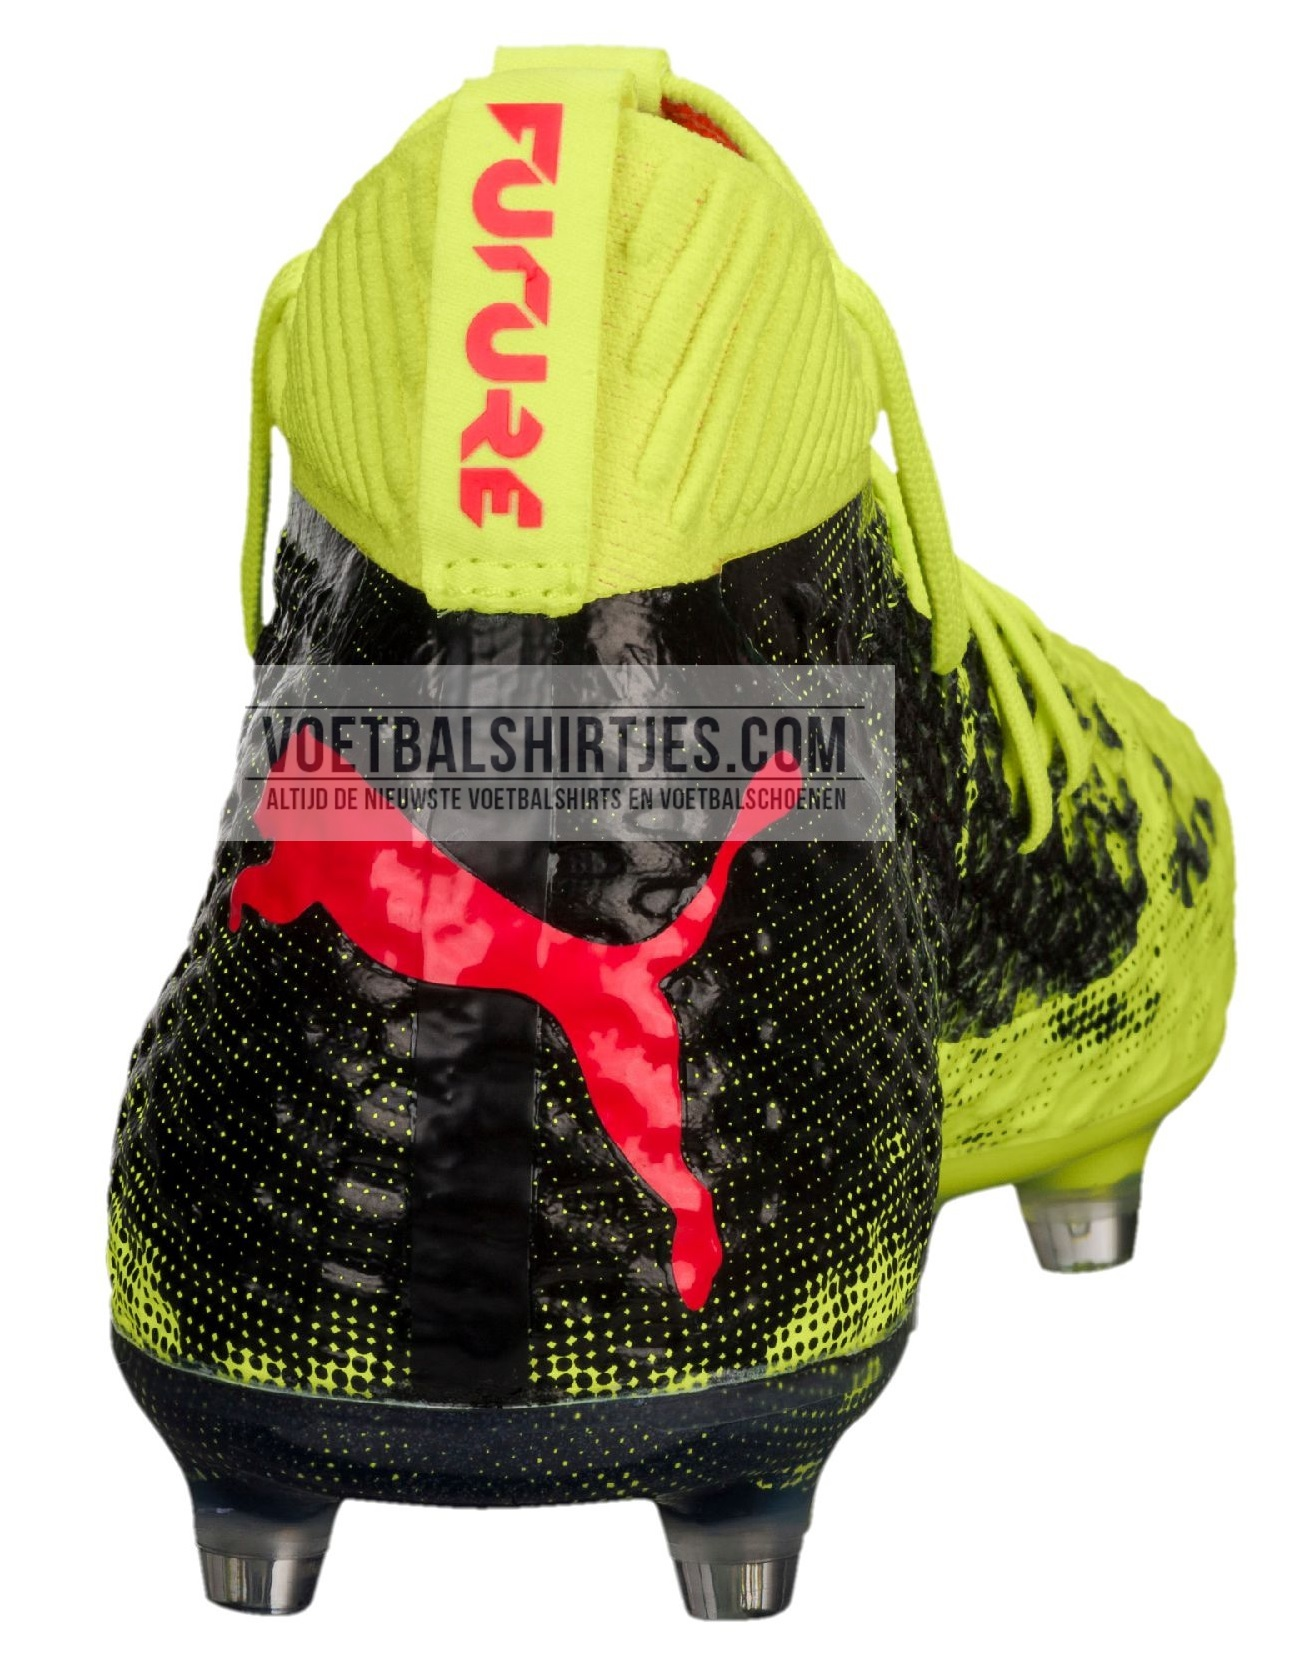 puma Future 2018 voetbalschoenen